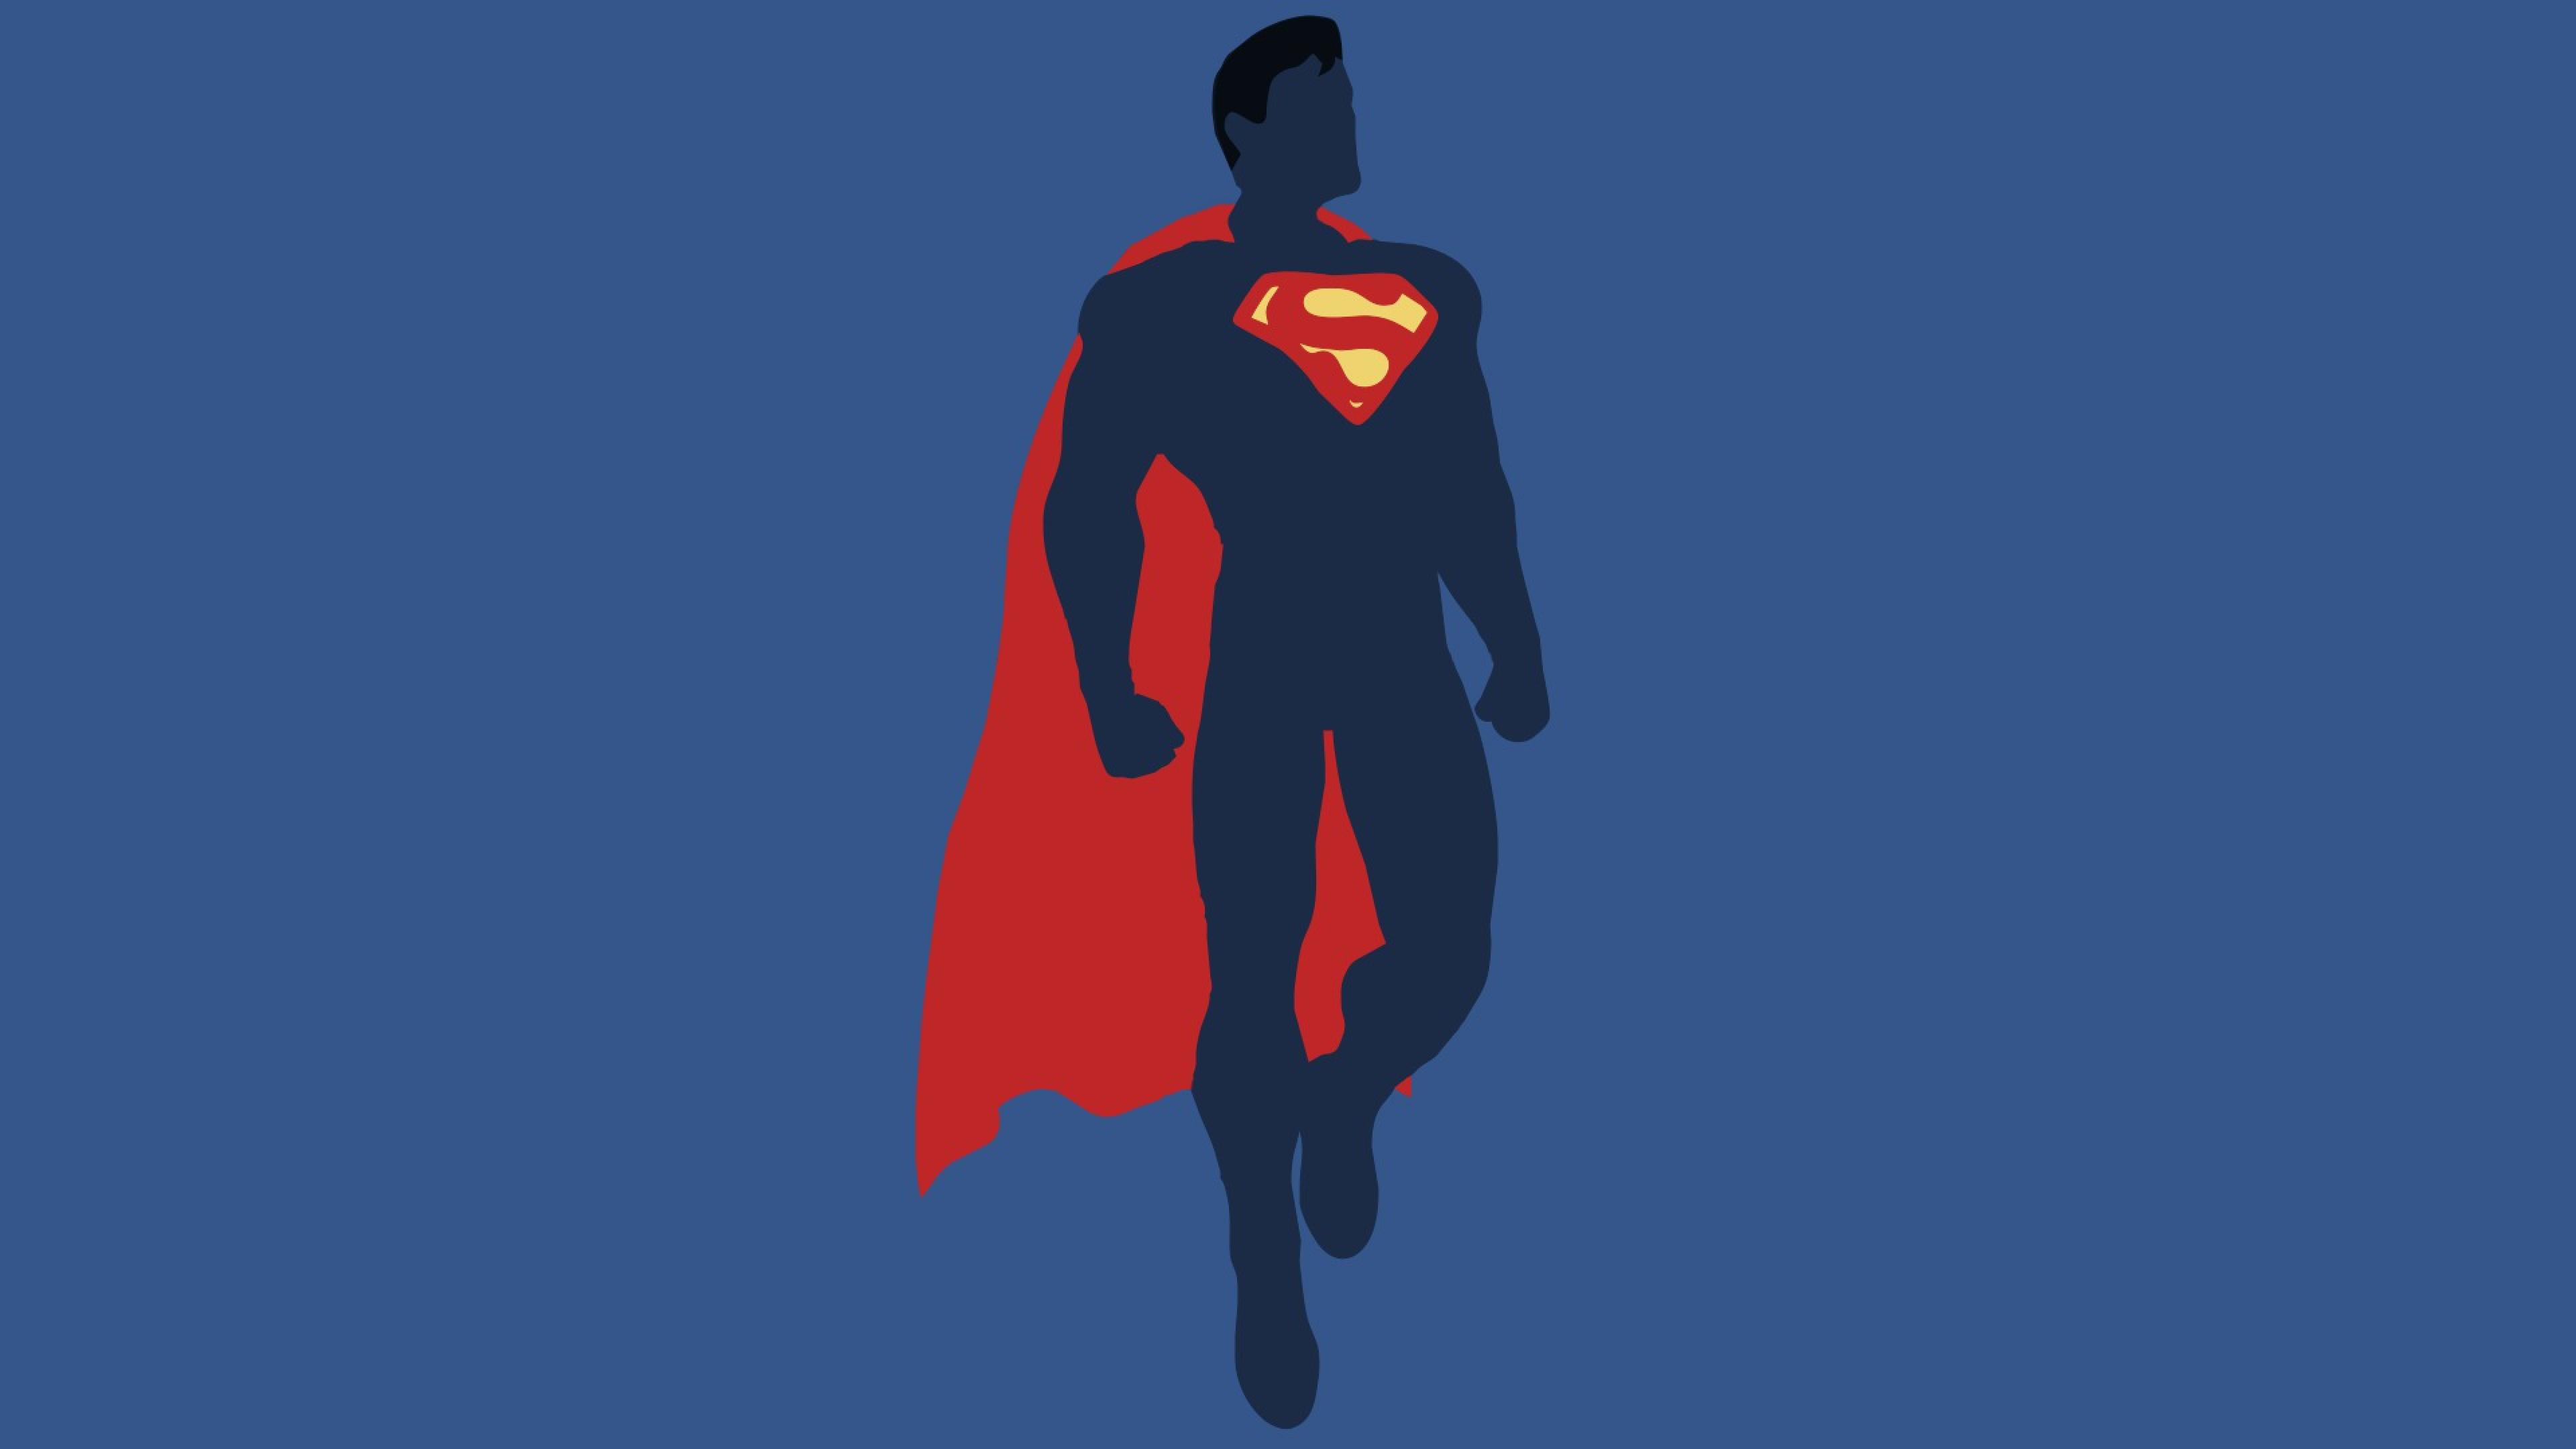 4K Superhero Wallpapers (52+ images)